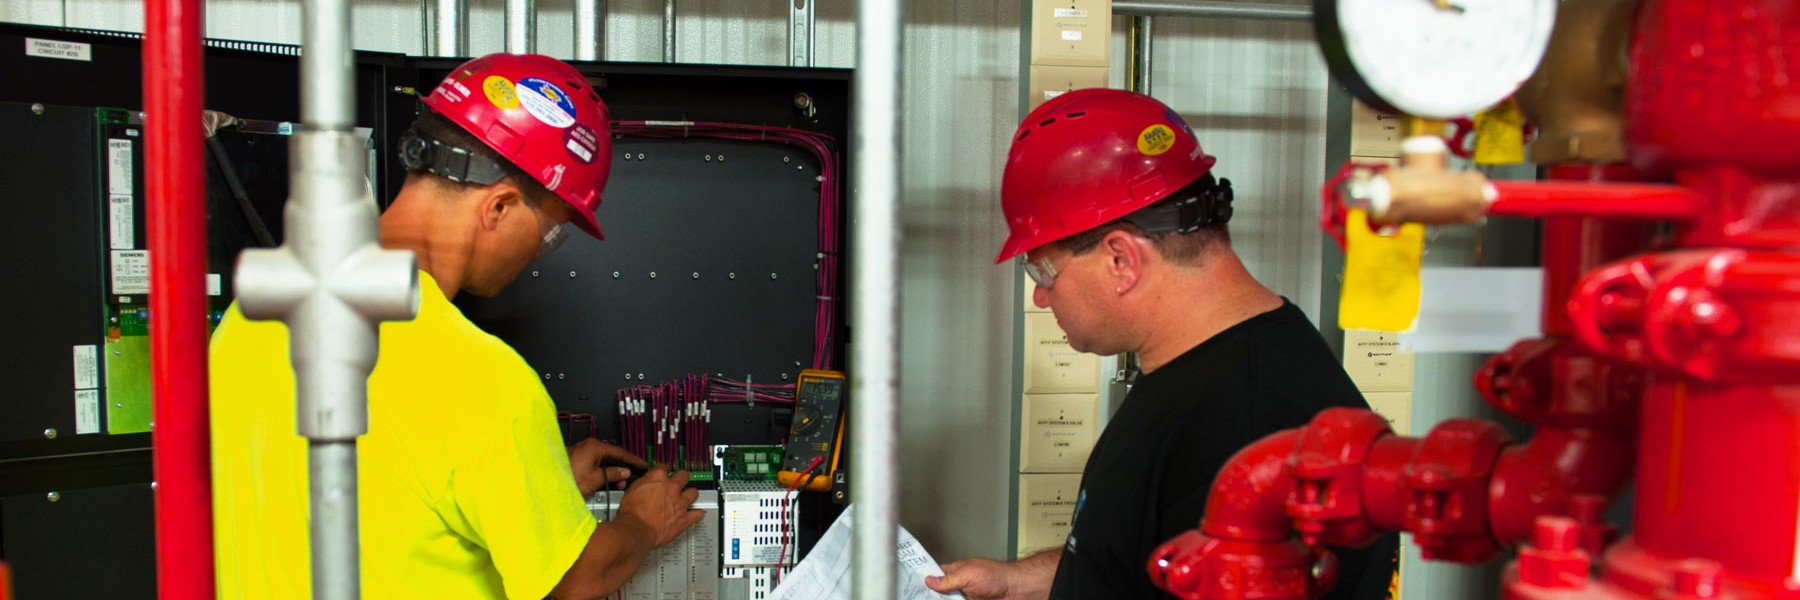 Employee Fire Safety Training Amp Accountability Davis